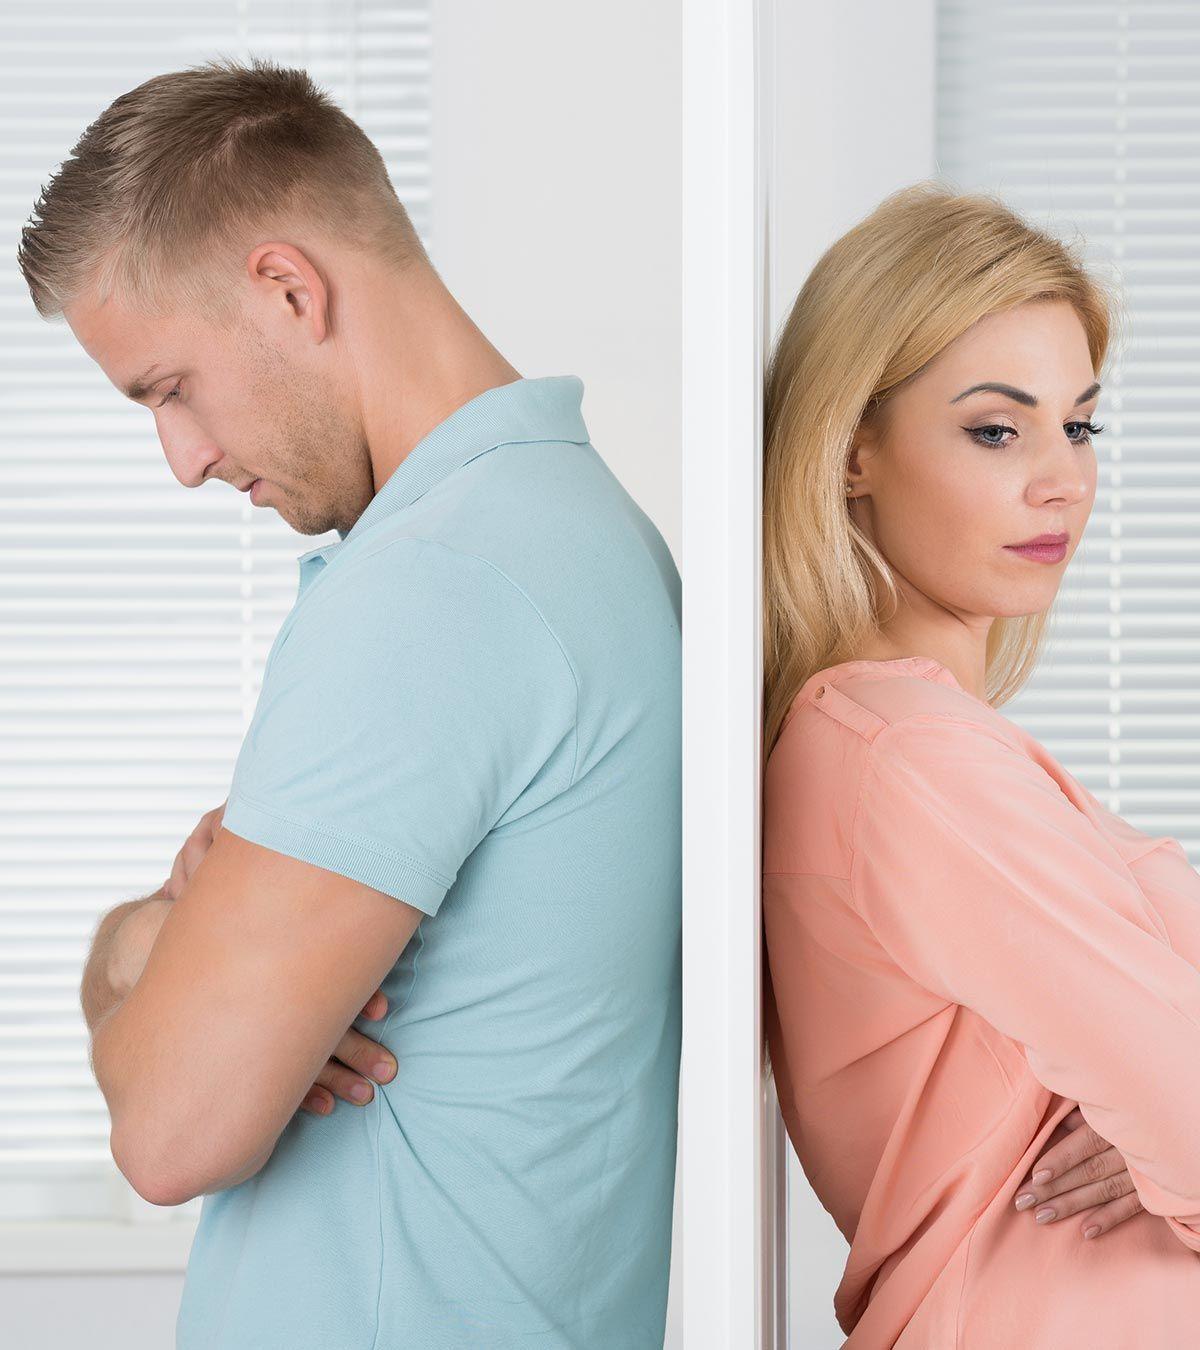 How To Fix A Broken Relationship 11 Ways To Repair It